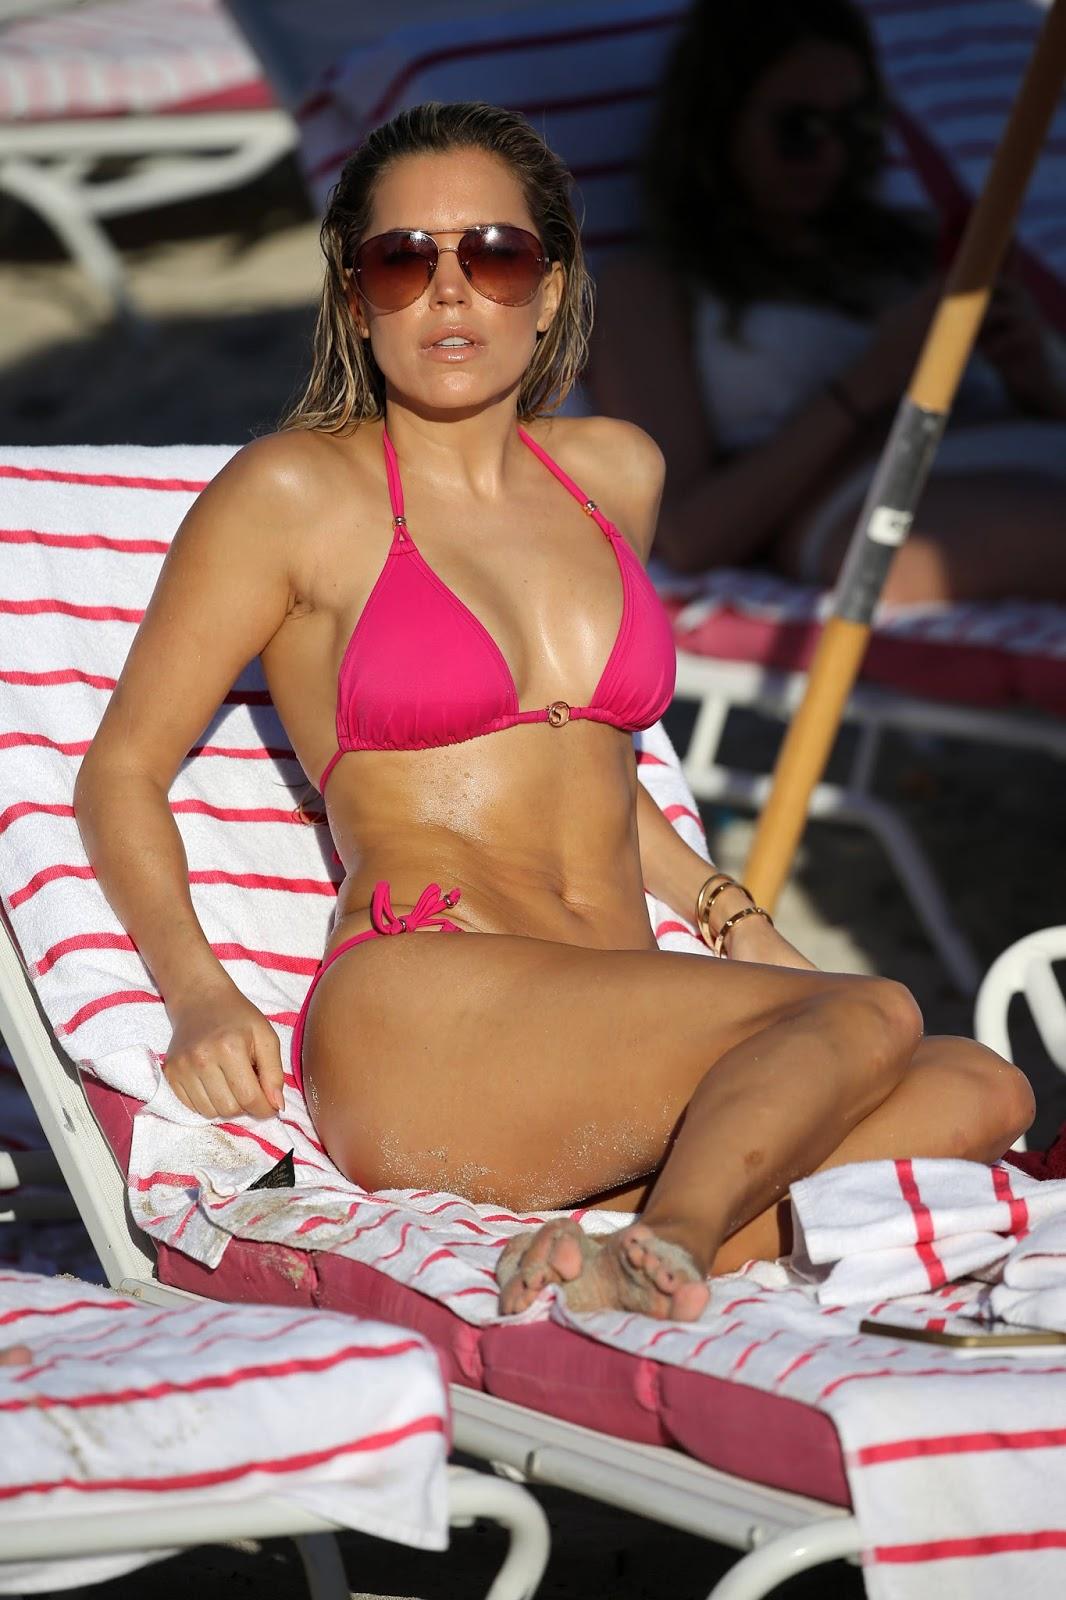 Sylvie Meis Hot Body in a Pink Bikini